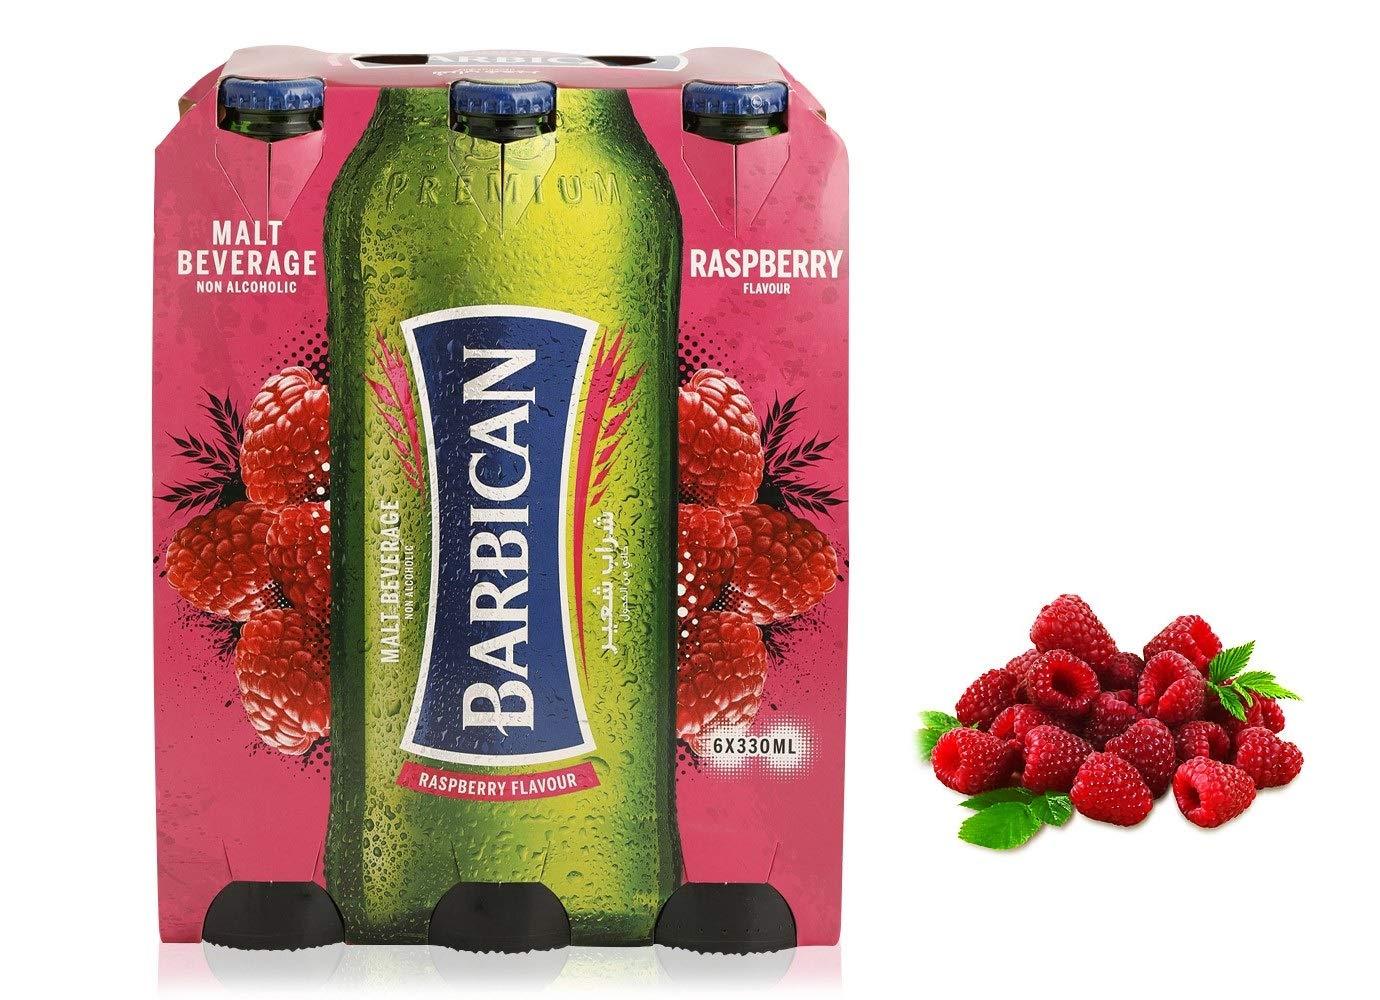 Compatible with Barbican Raspberry Flavor Malt Beverage